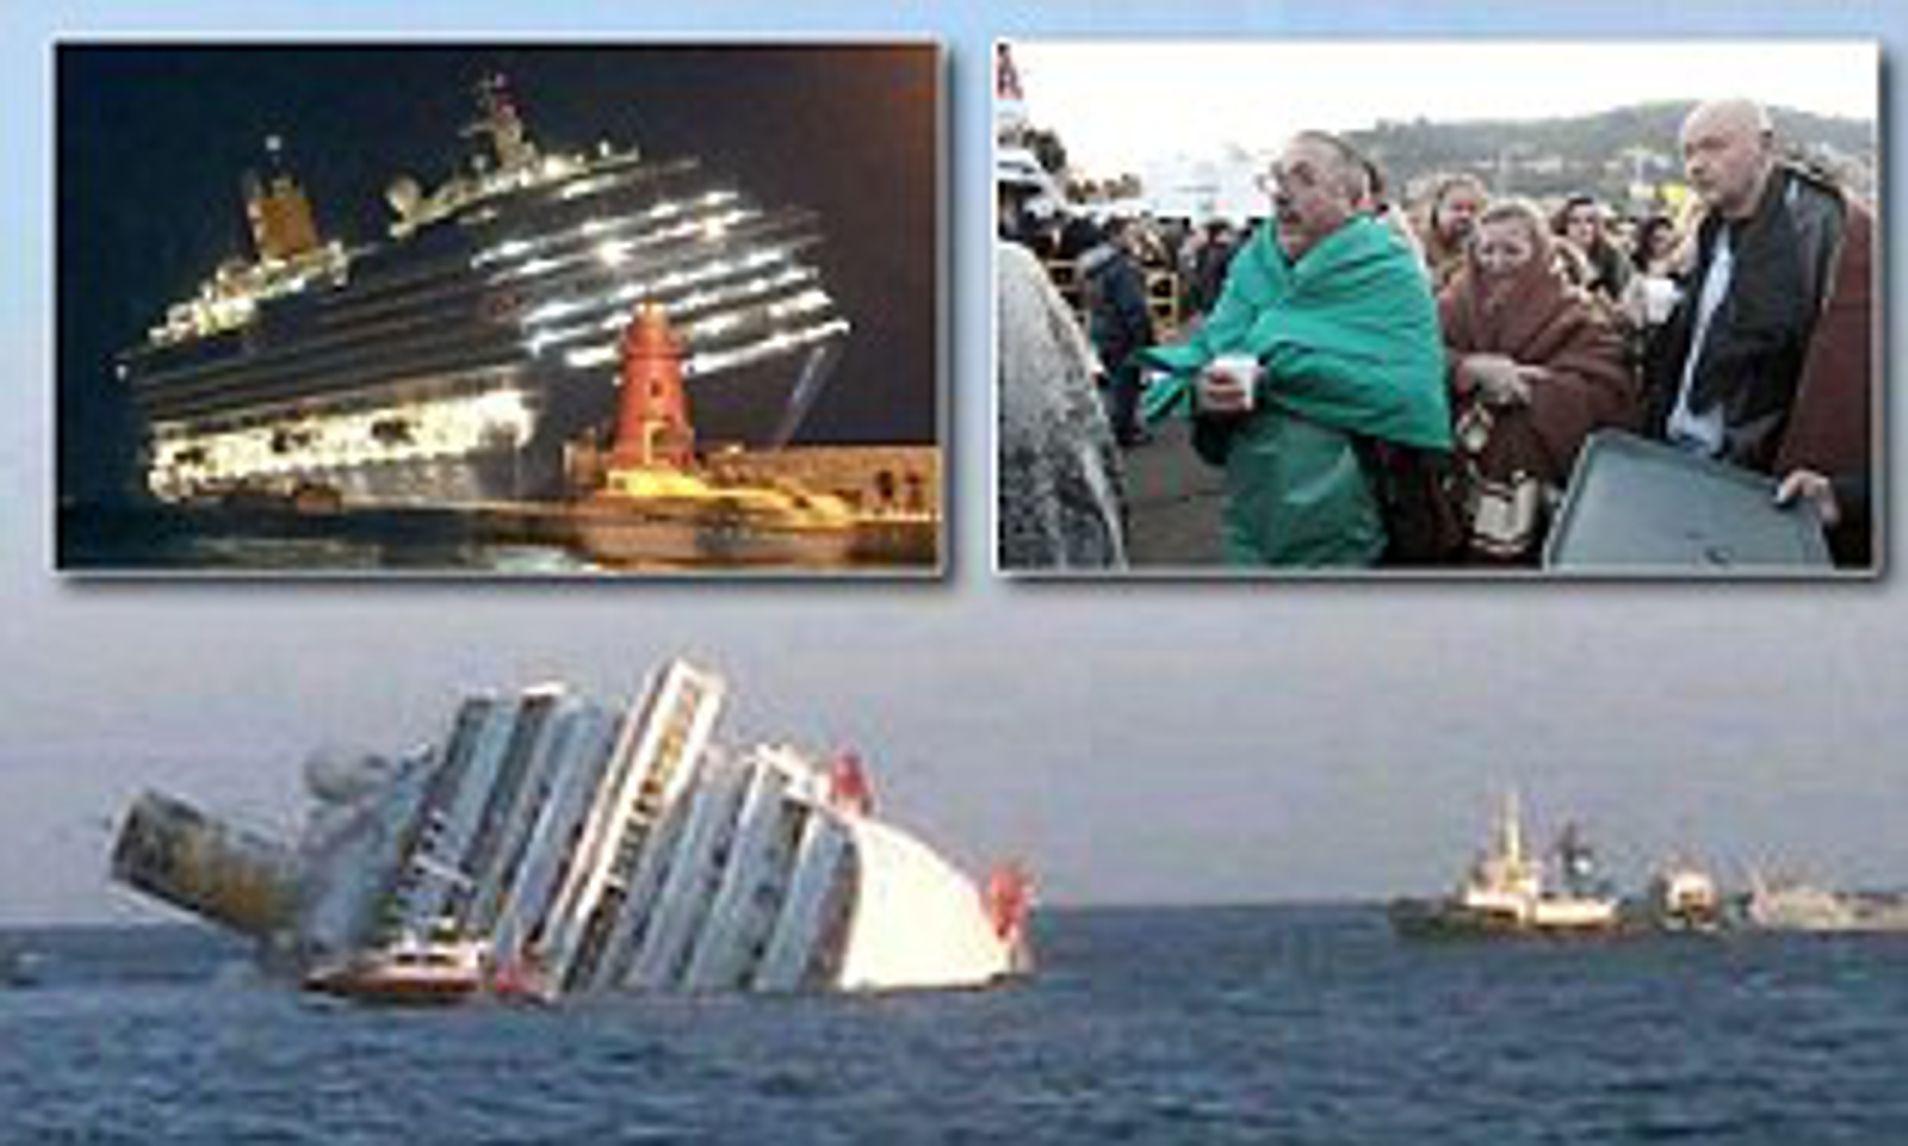 cruise ship sinking off coast of italy